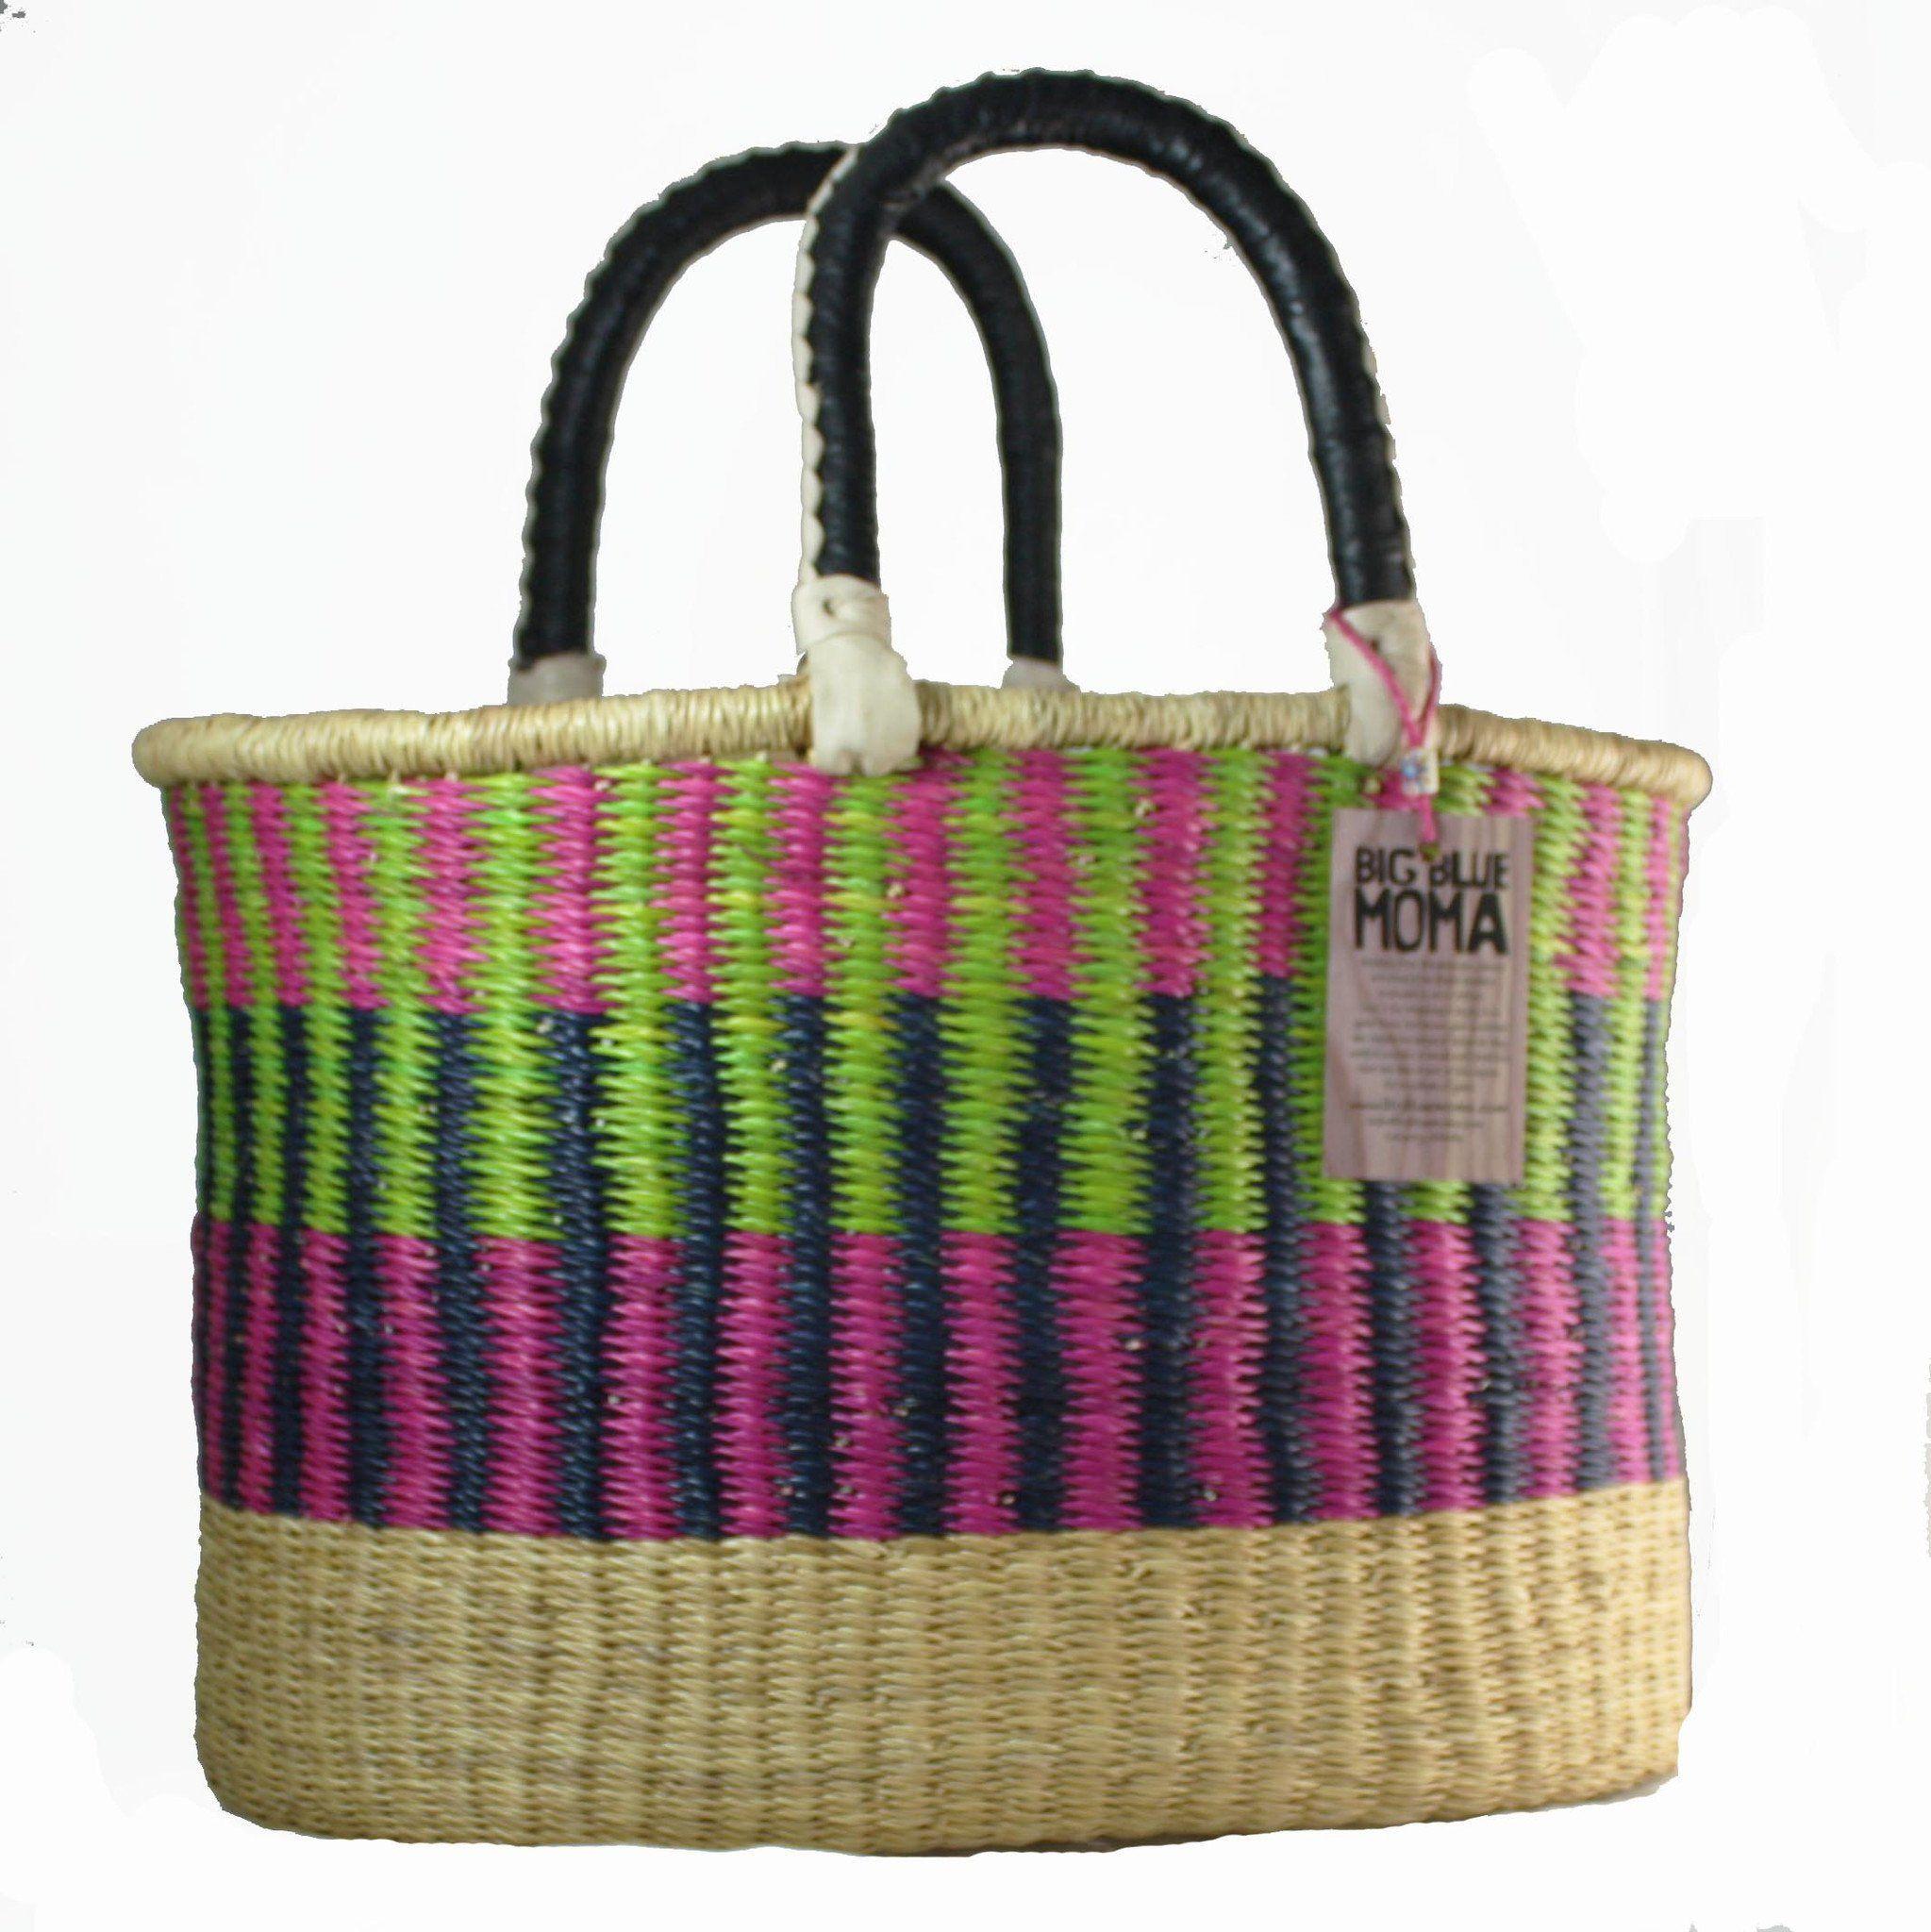 Basket Weaving Ghana : Market baskets ghana bolga handmade weaving